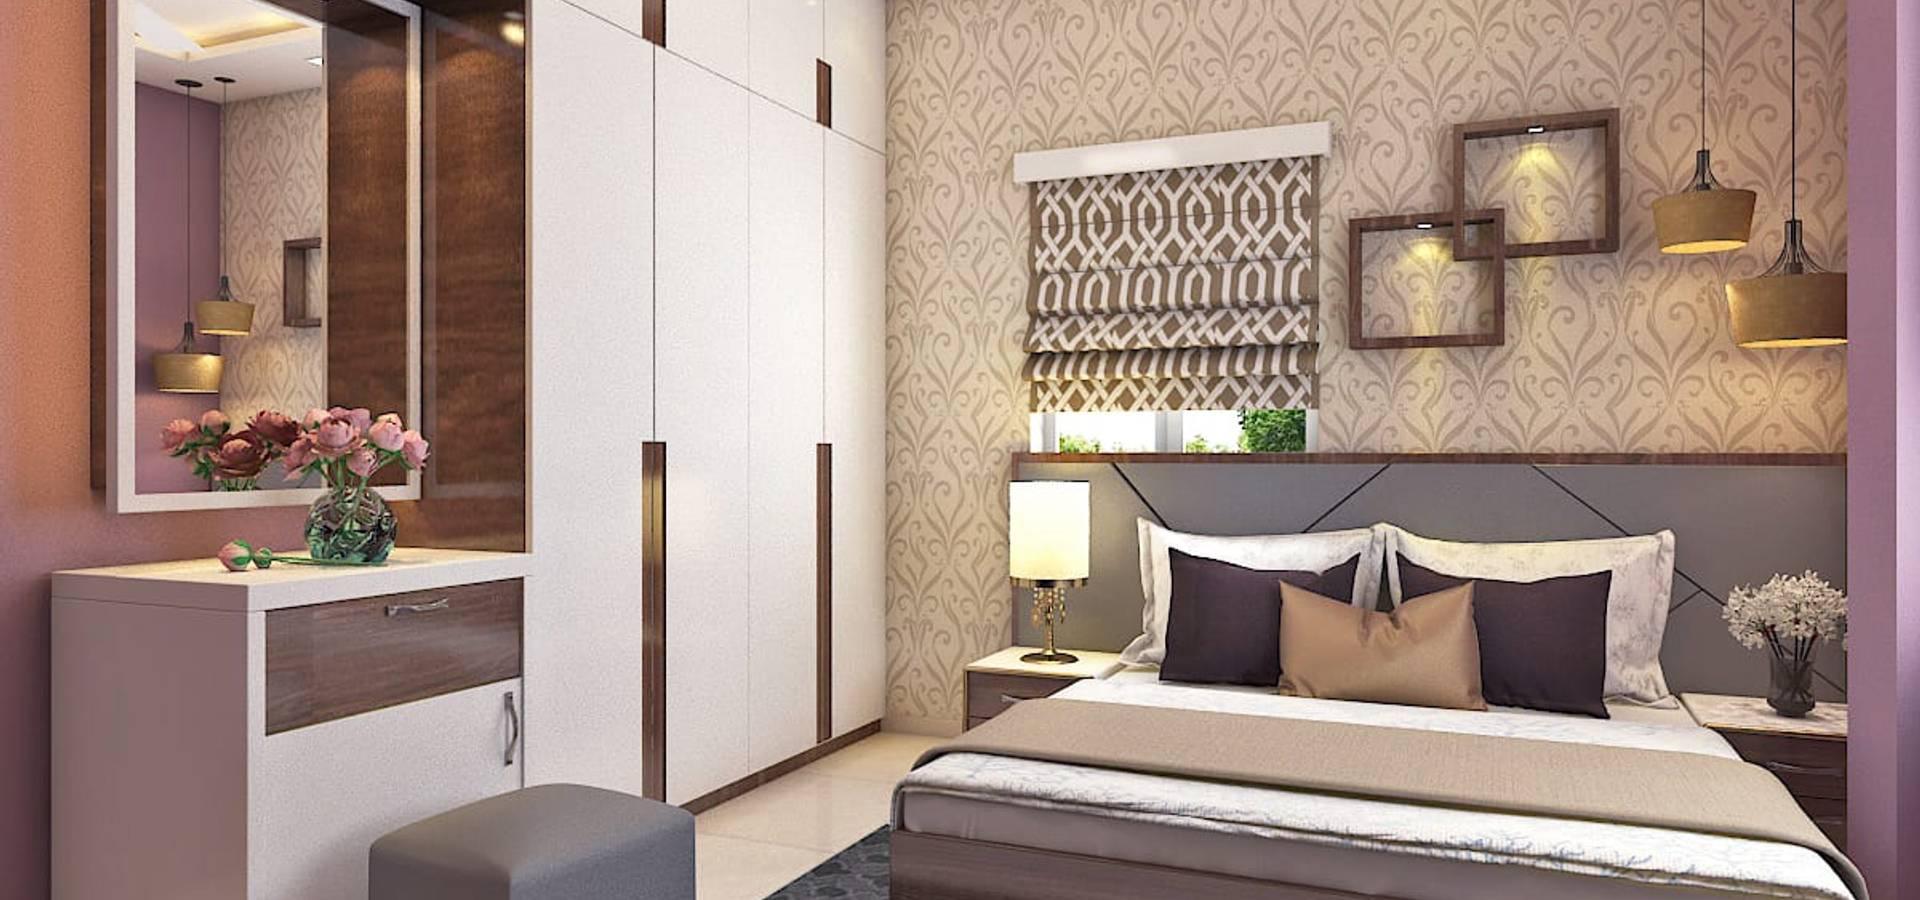 2 Bhk Interior Design In Kolkata By Best Luxury Interiors Homify